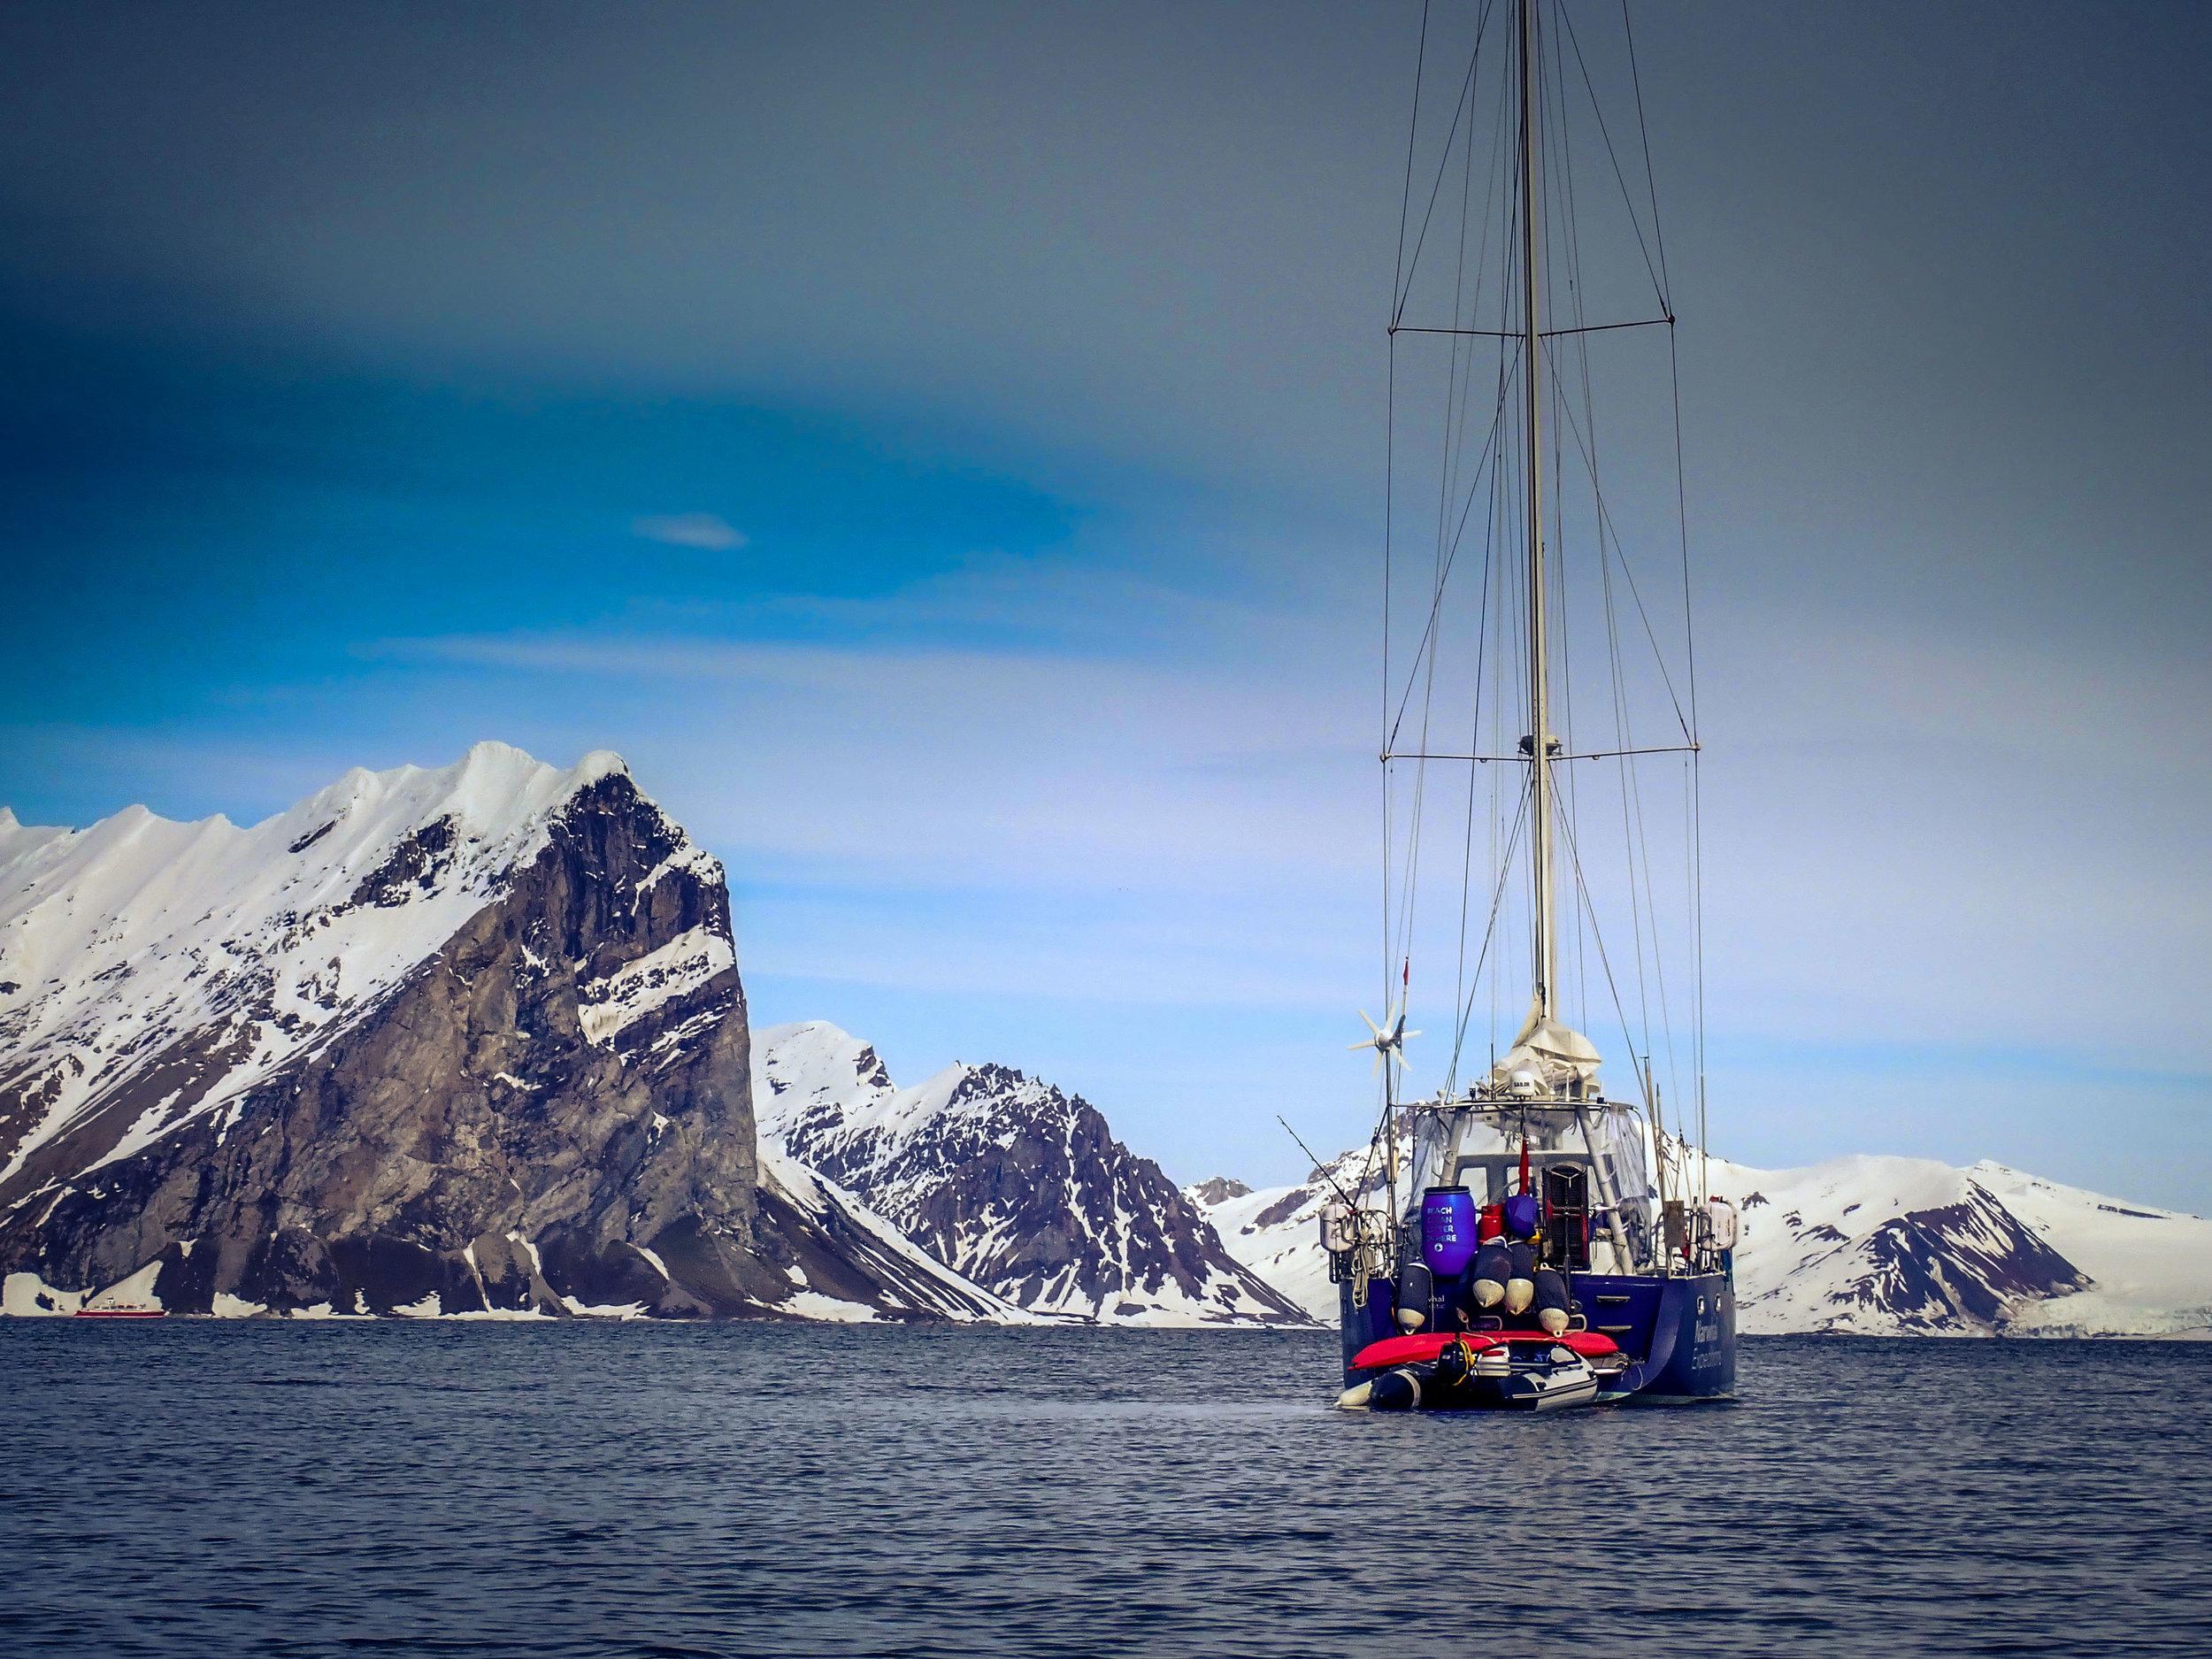 Expedition yacht Narwhal in Hornsund, Svalbard